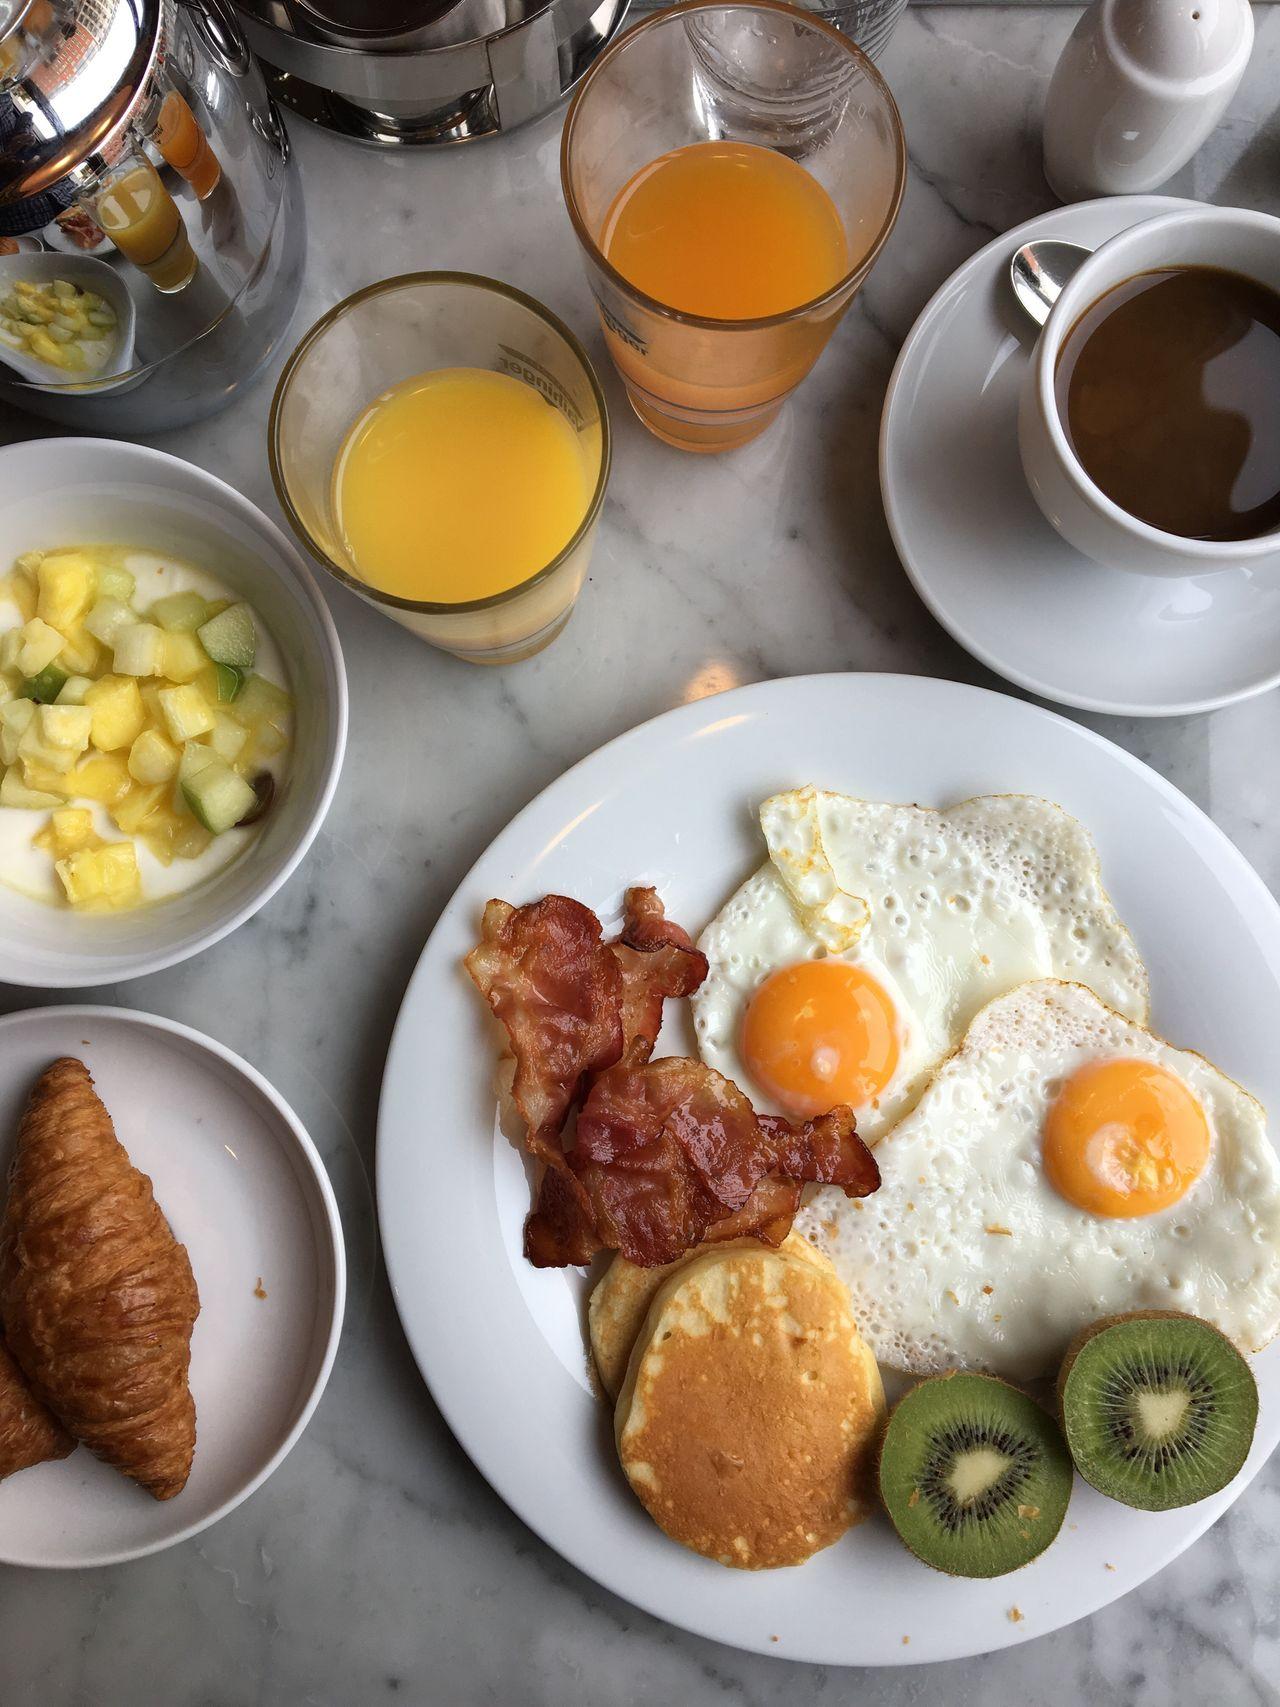 Guten Morgen & schöne Grüße aus Berlin. Diggin' the Breakfast Buffet here at Titanic.